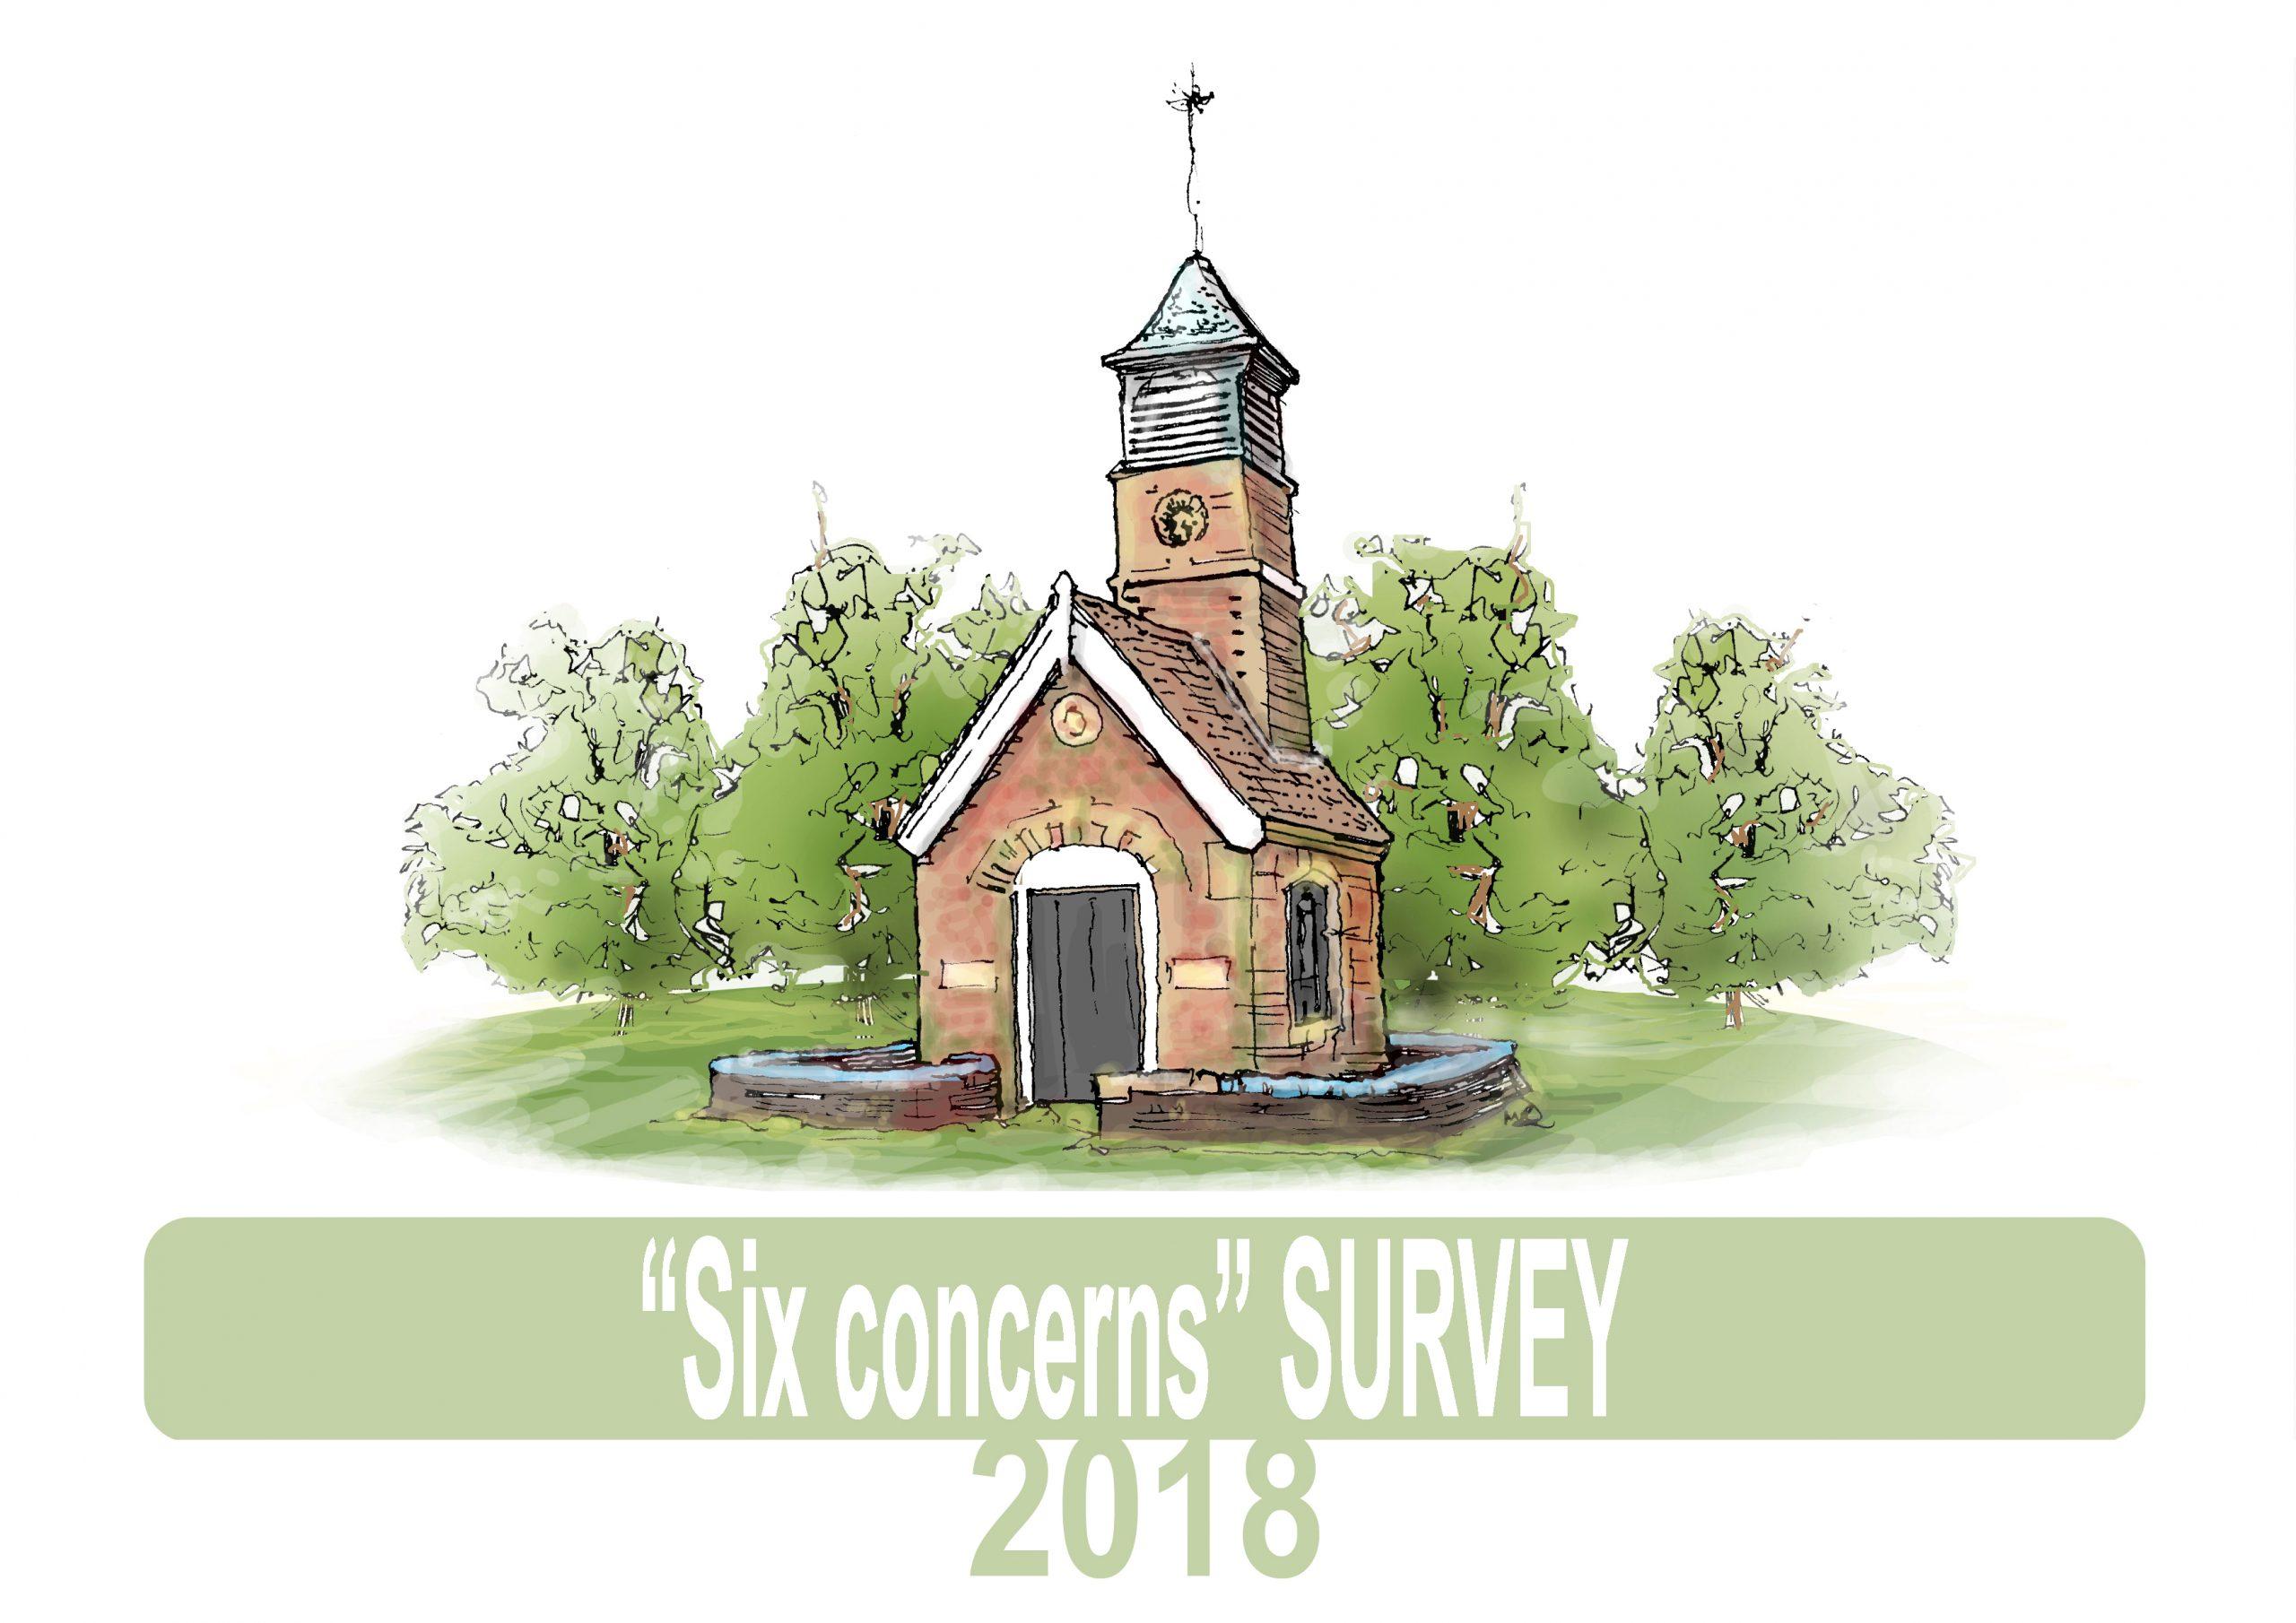 Six concerns survey graphic by Martin Richardson of ARTMART